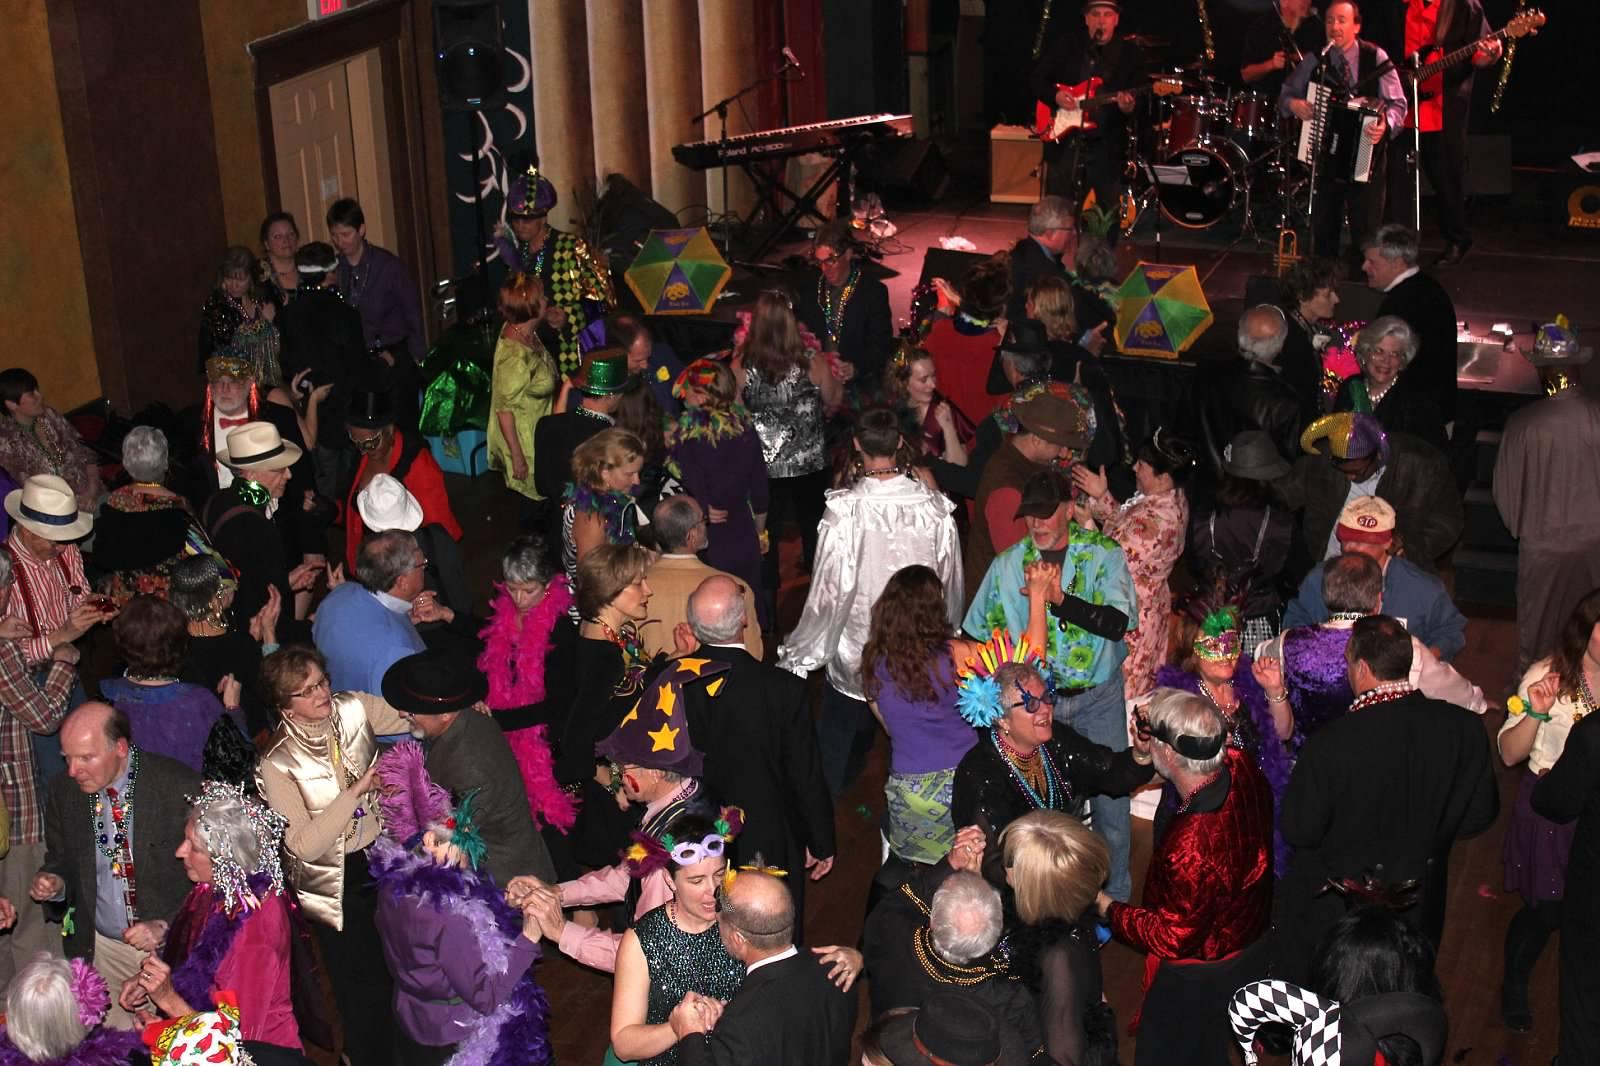 Mardi Gras Dance Party